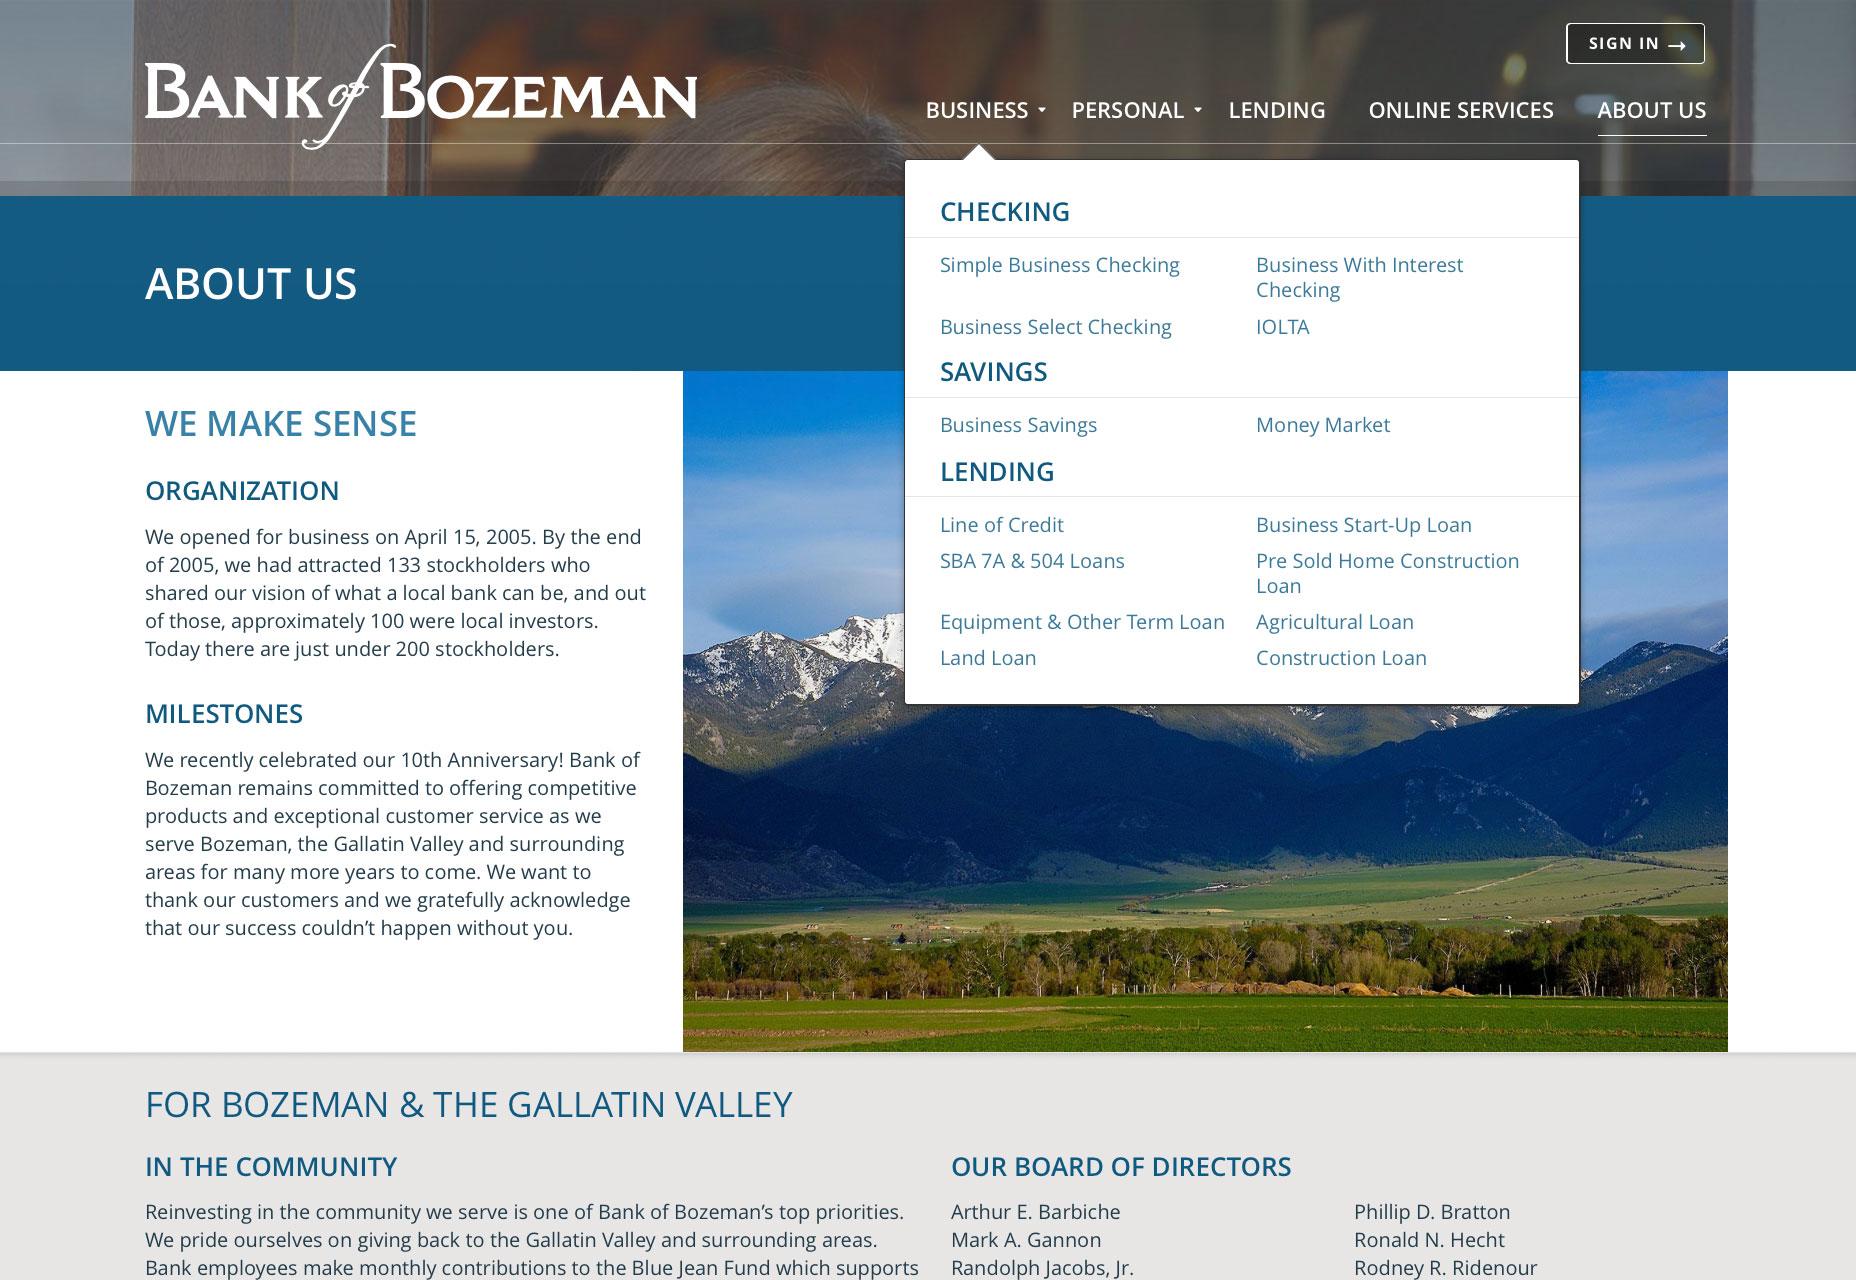 bank-of-bozeman